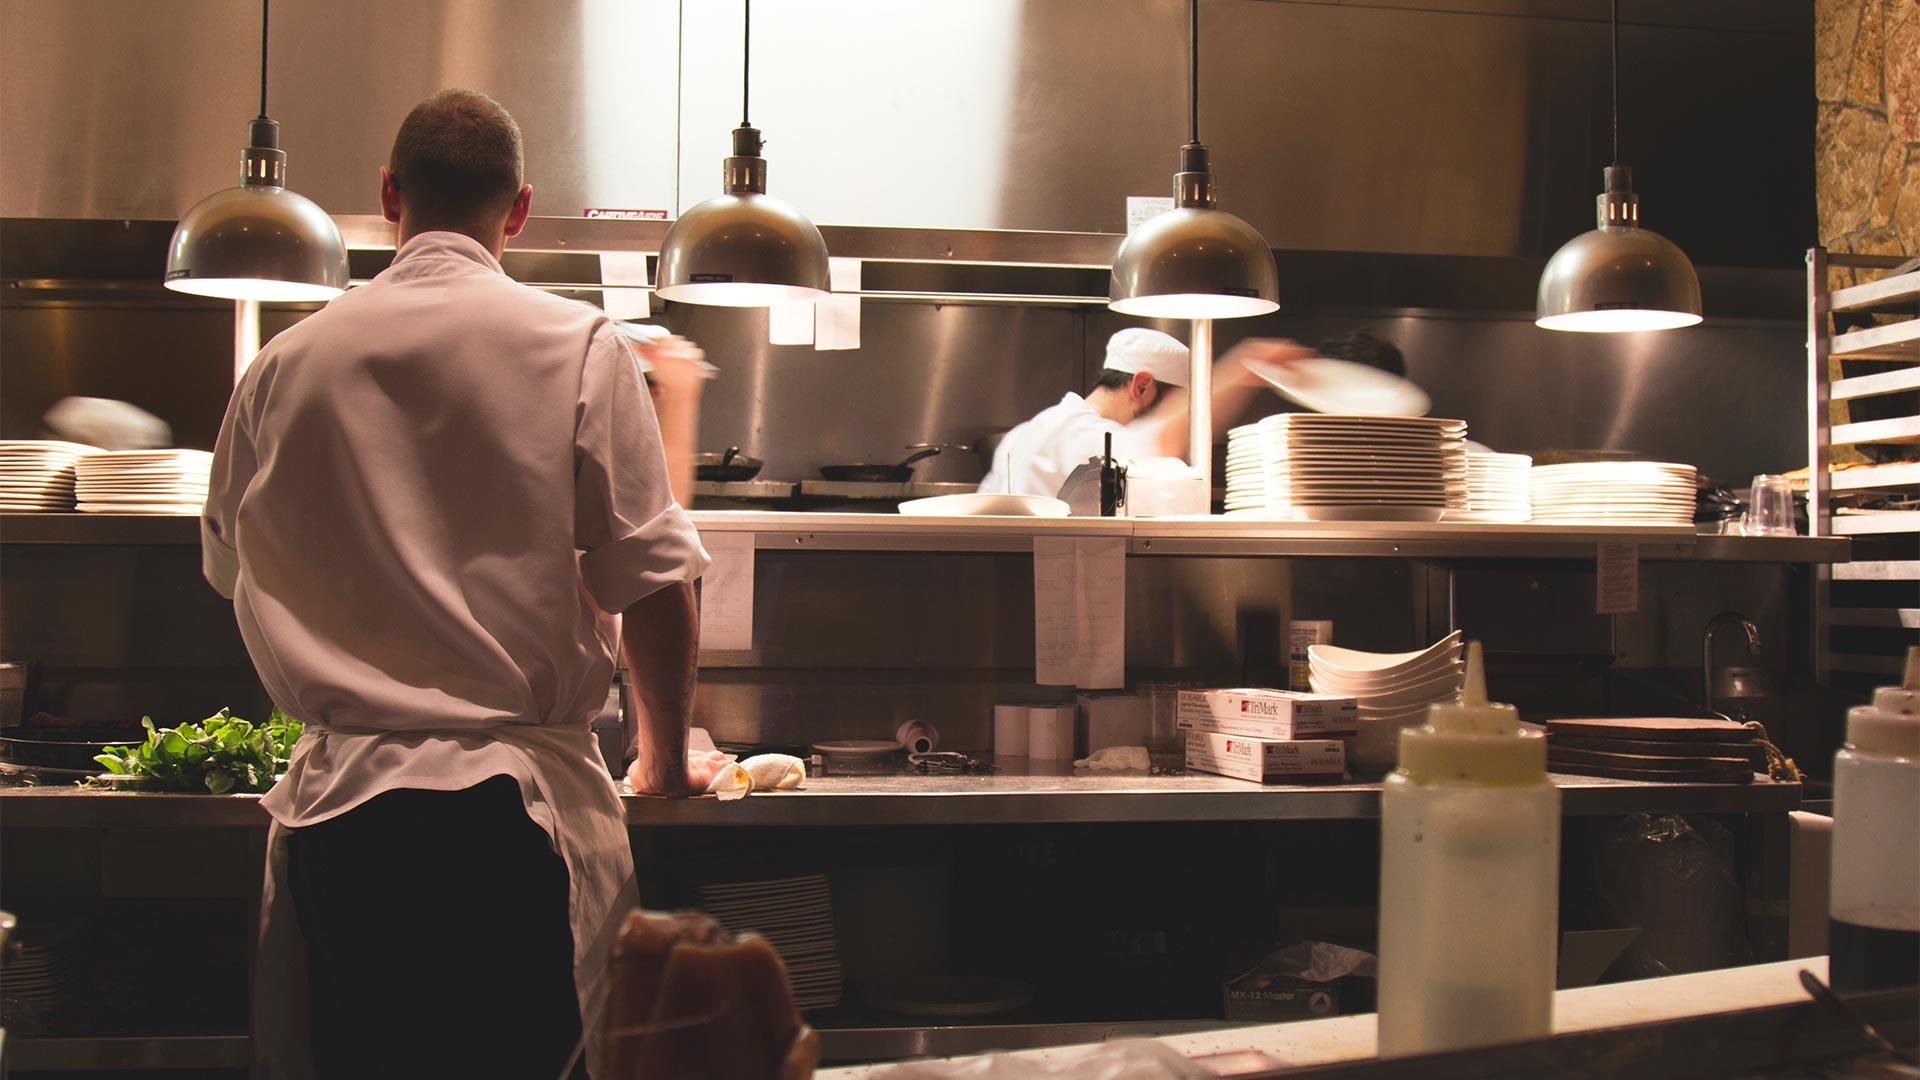 Seguro sector servicios restaurante